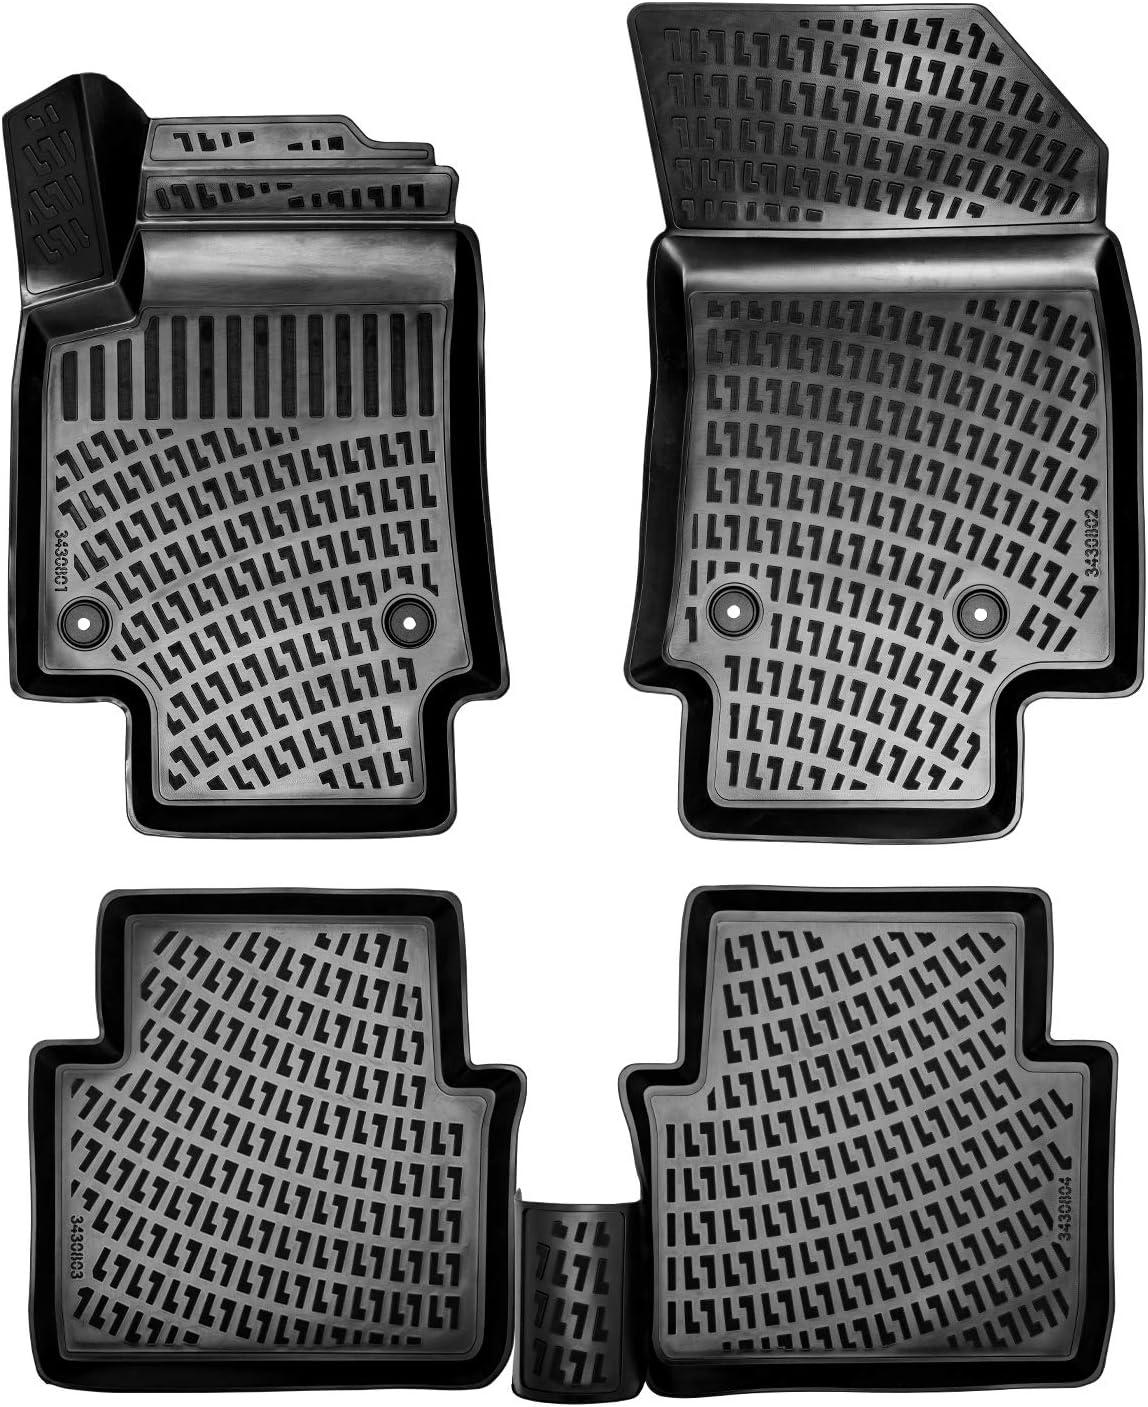 Rizline 3d Gummimatten Auto Matten Fussmatten Kompatibel Mit Vw Passat B8 Ab 2014 Passgenaue Mit Hohem Rand C A 5 Cm Auto